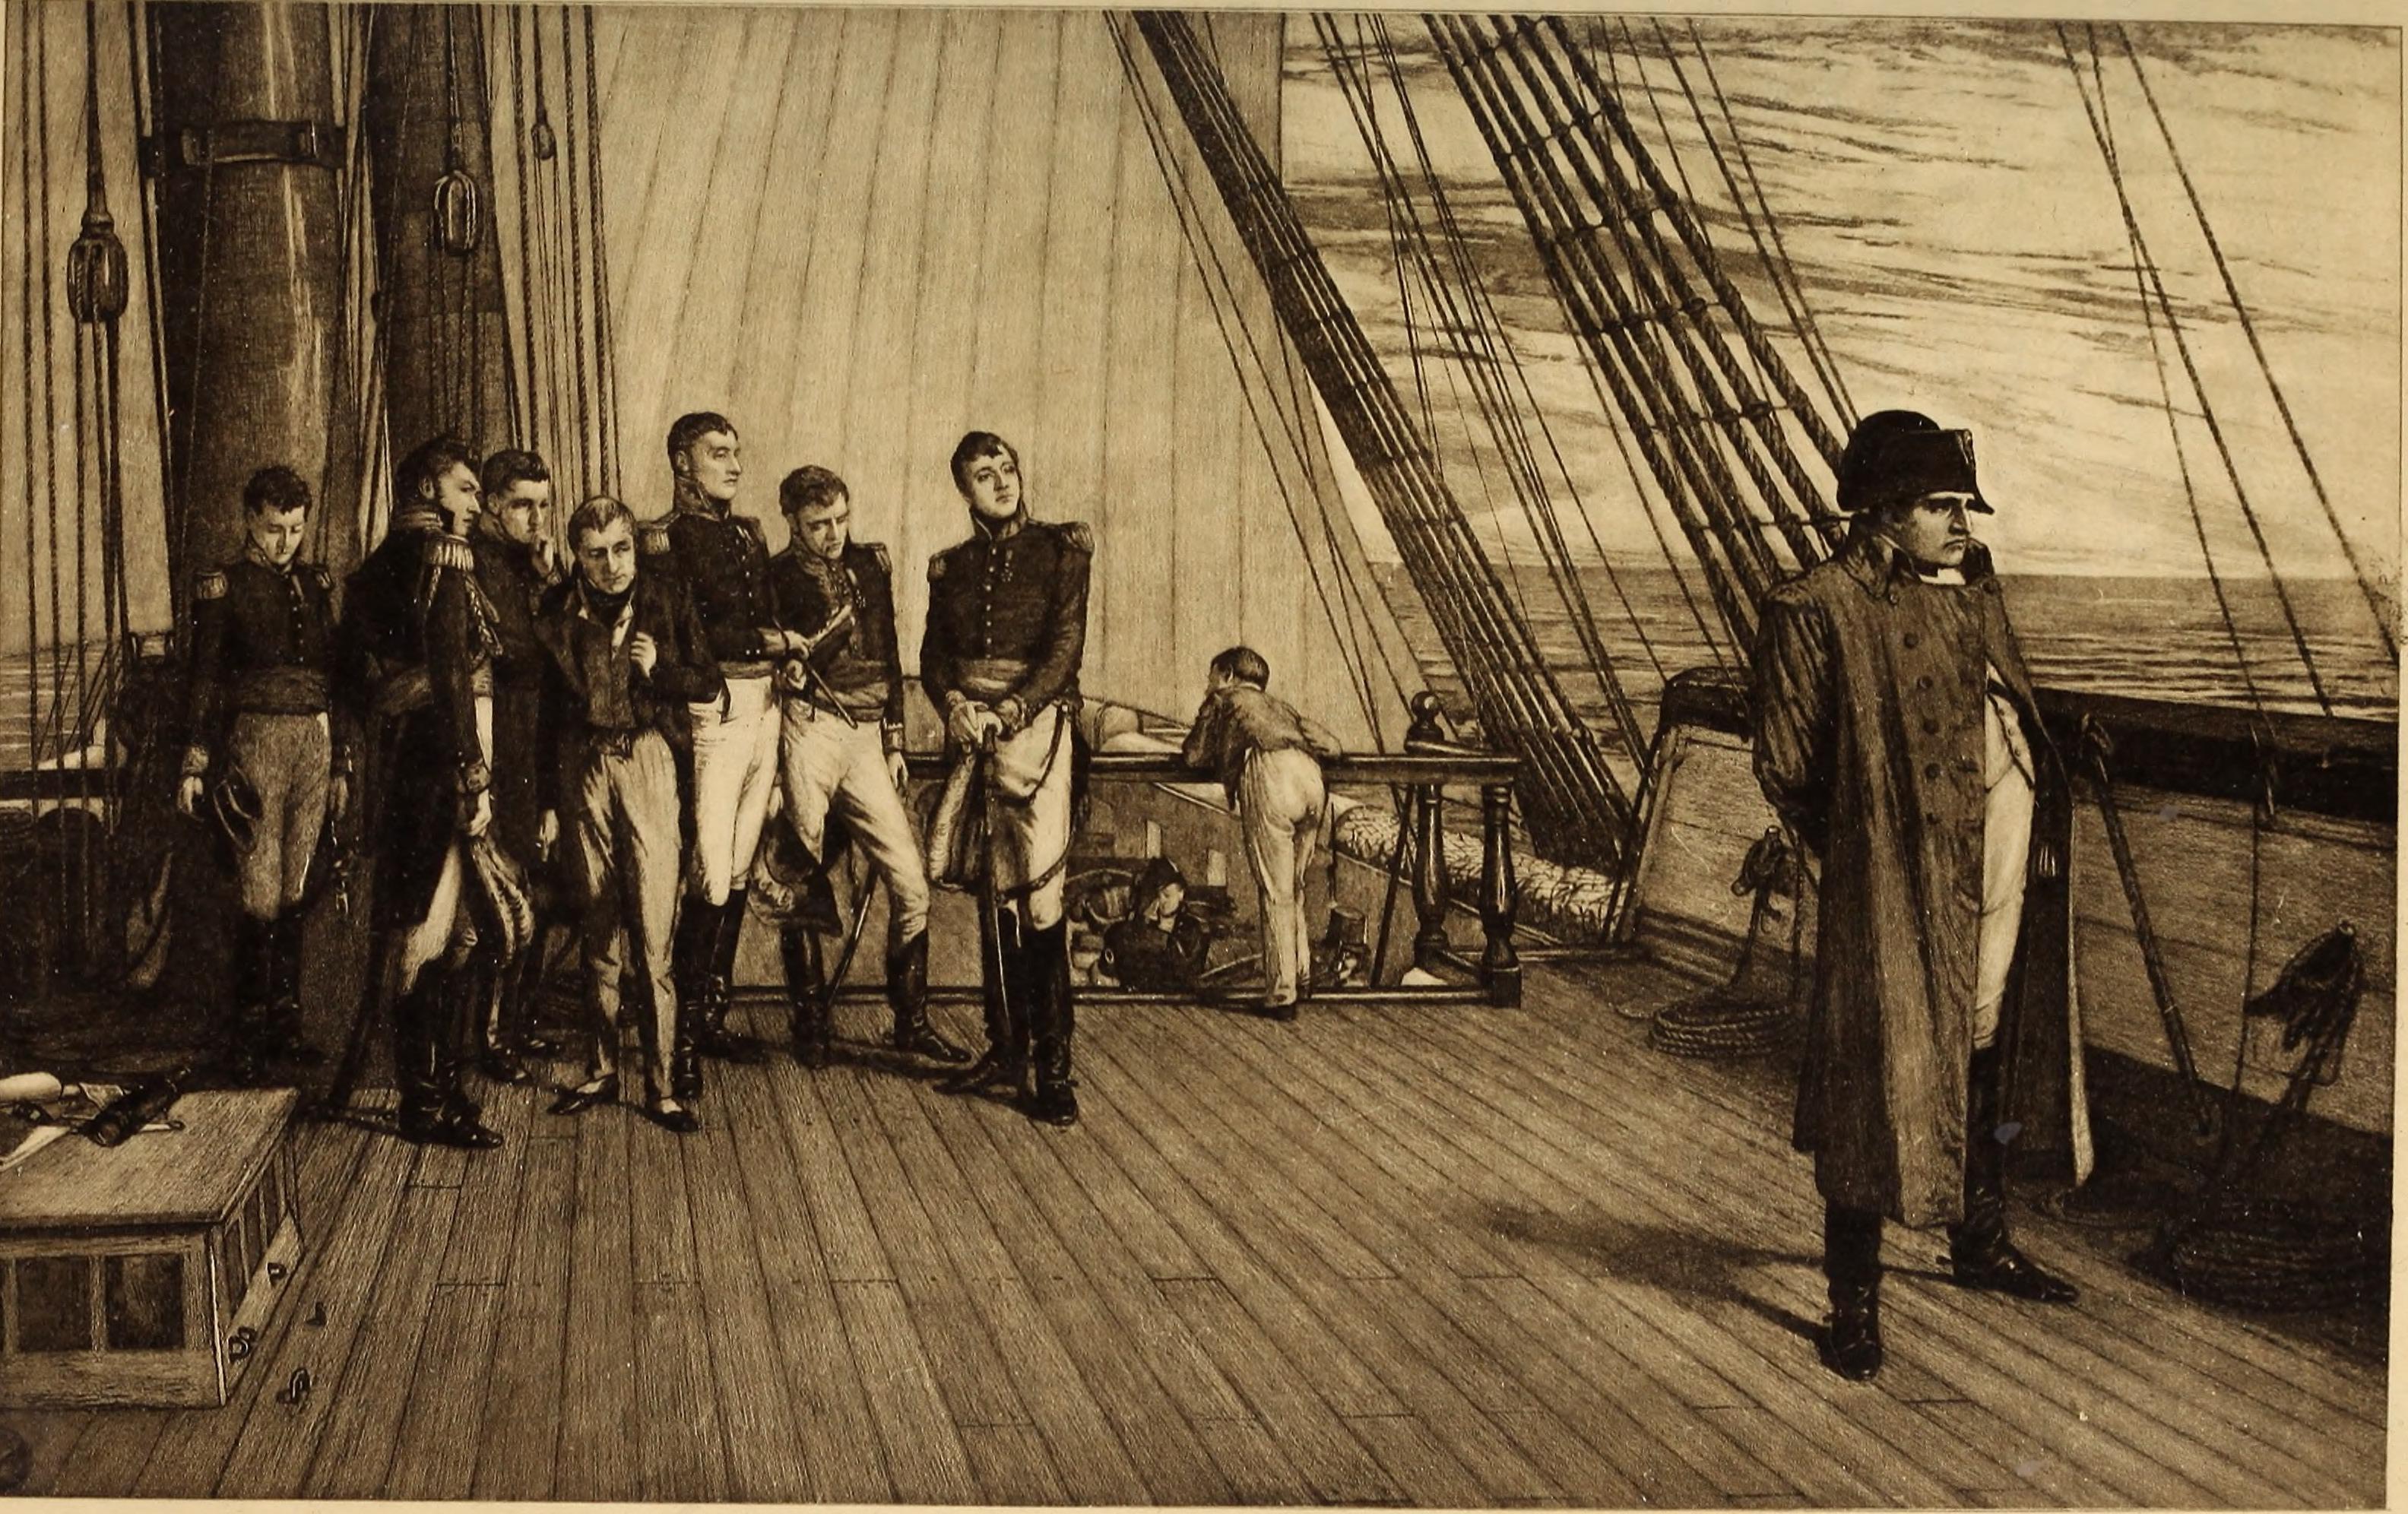 File:Napoleon Bonaparte on board the British ship Bellerophon.jpg -  Wikimedia Commons